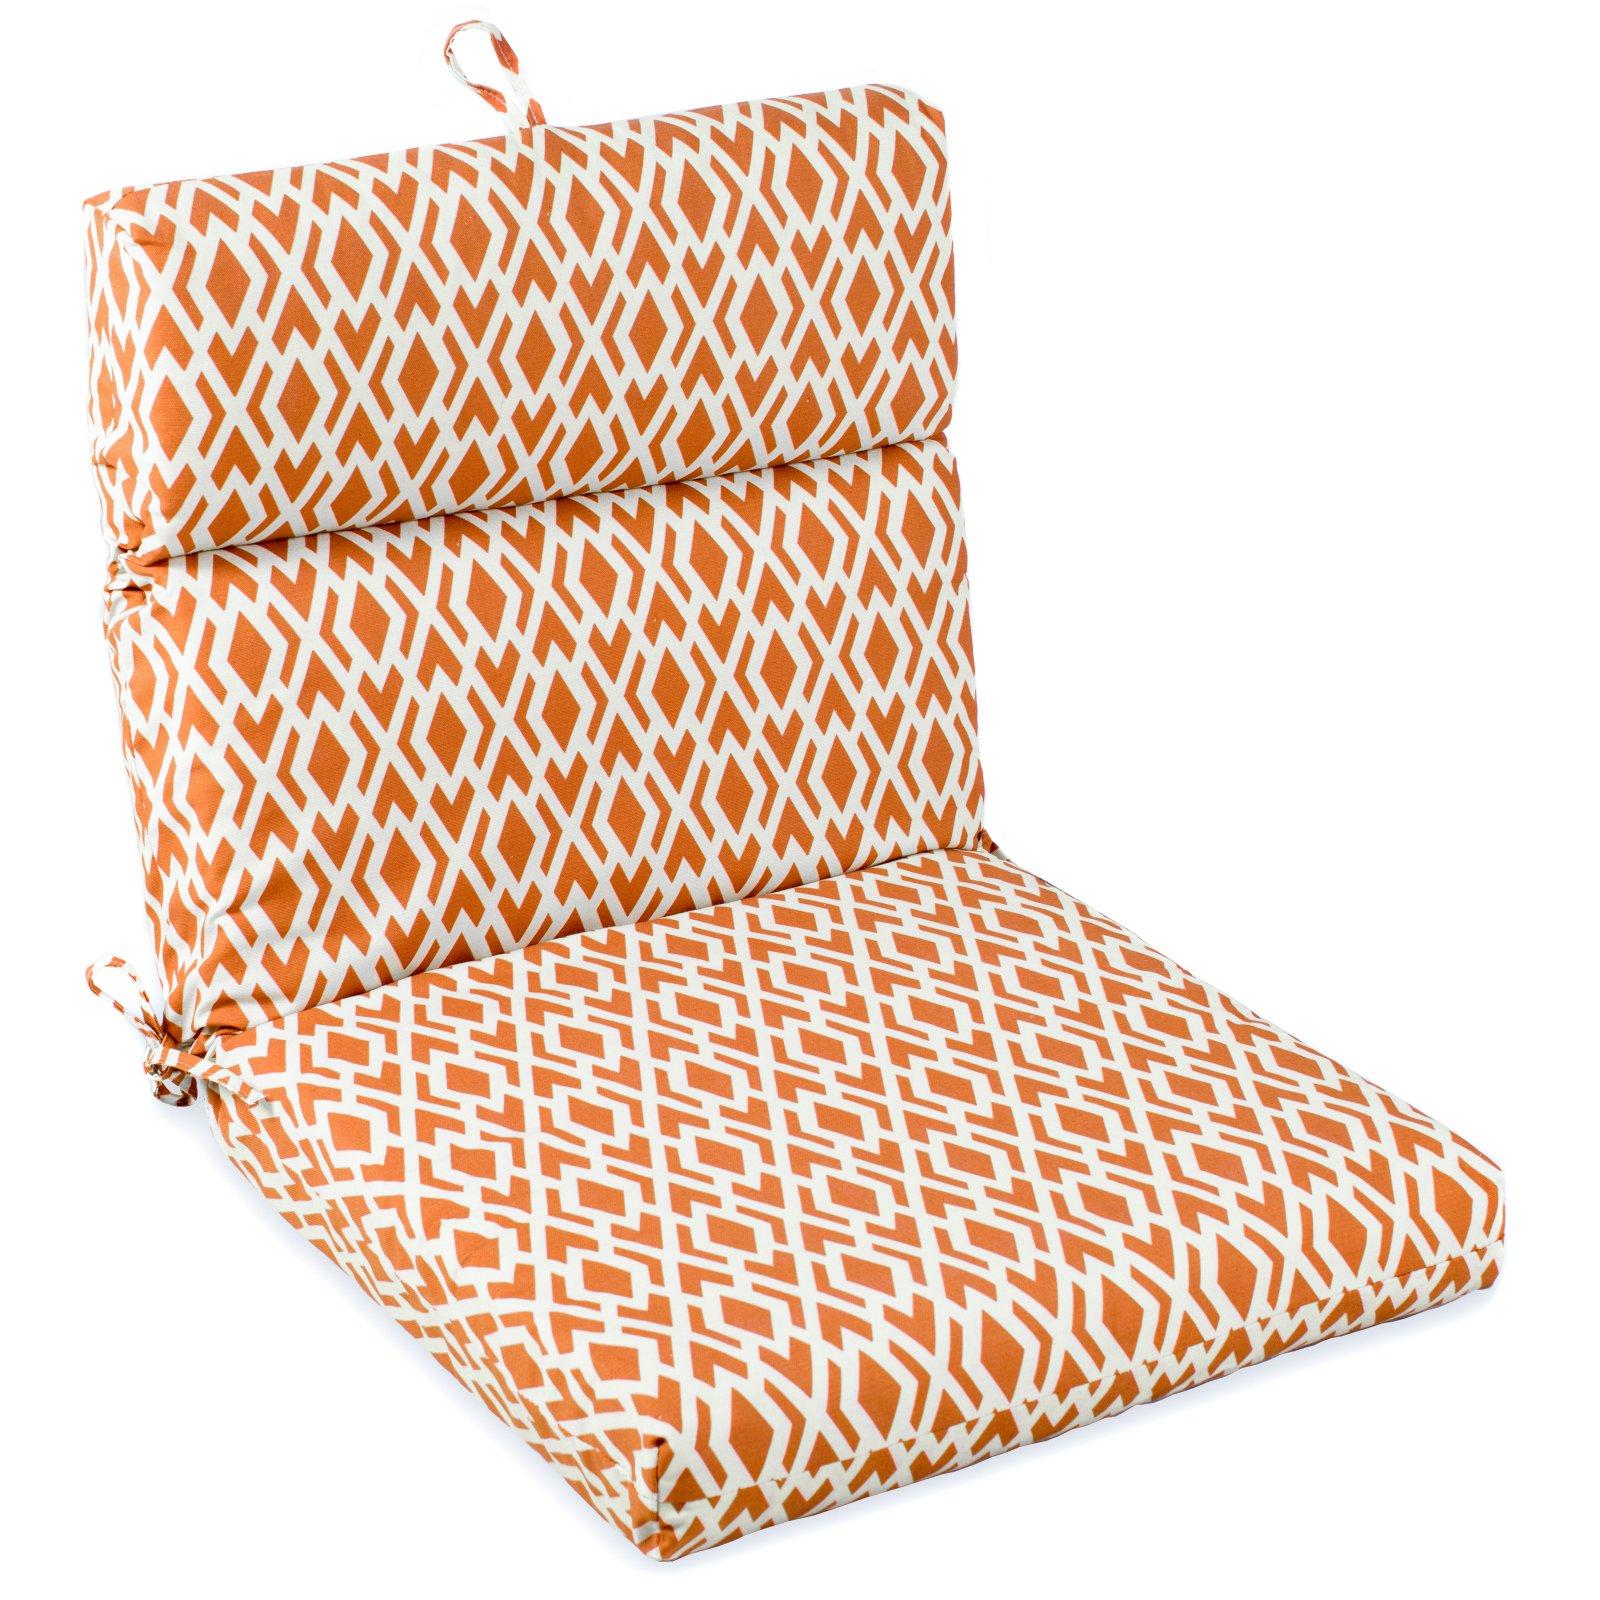 Coral Coast Geo French Edge Outdoor Chair Cushion